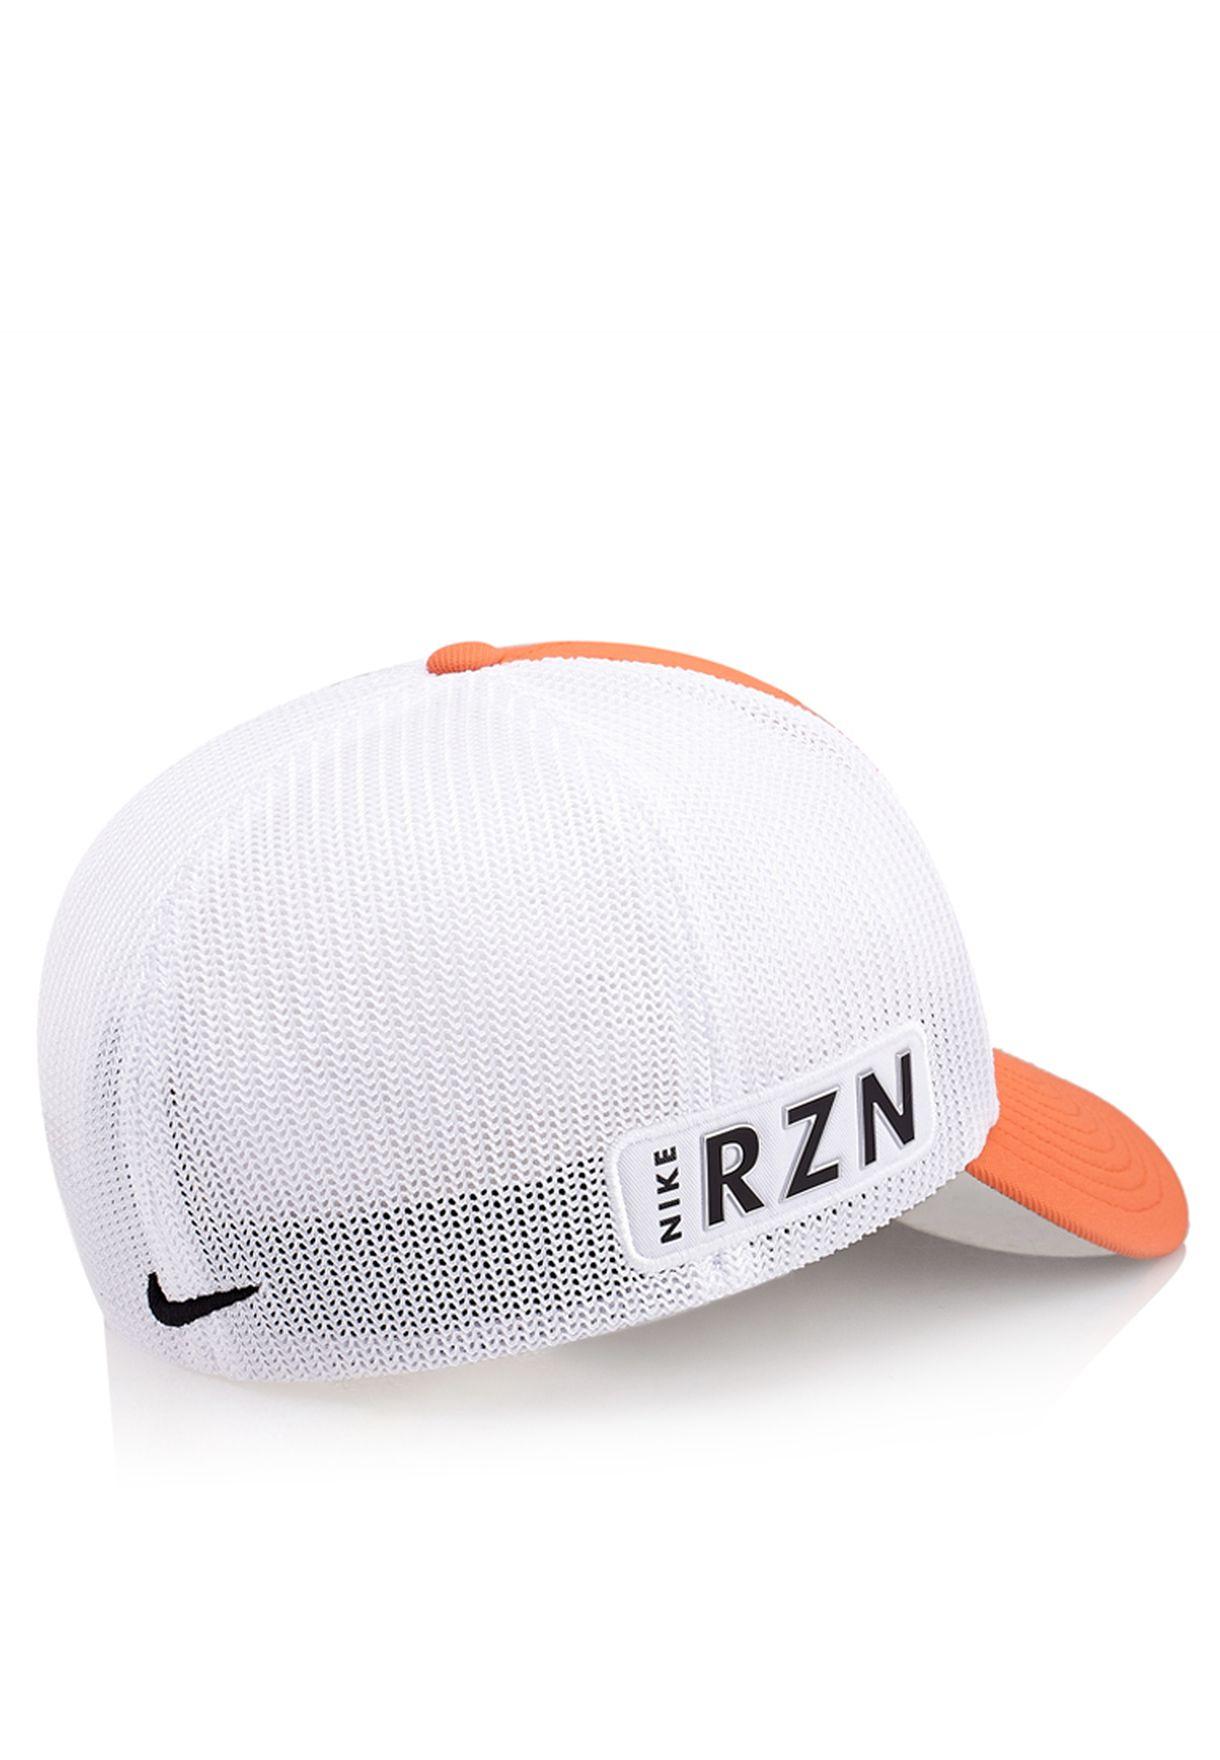 b92240d59a4 Shop Nike orange Tour Flex-Fit Golf Cap NKGF-638291-841 for Men in ...